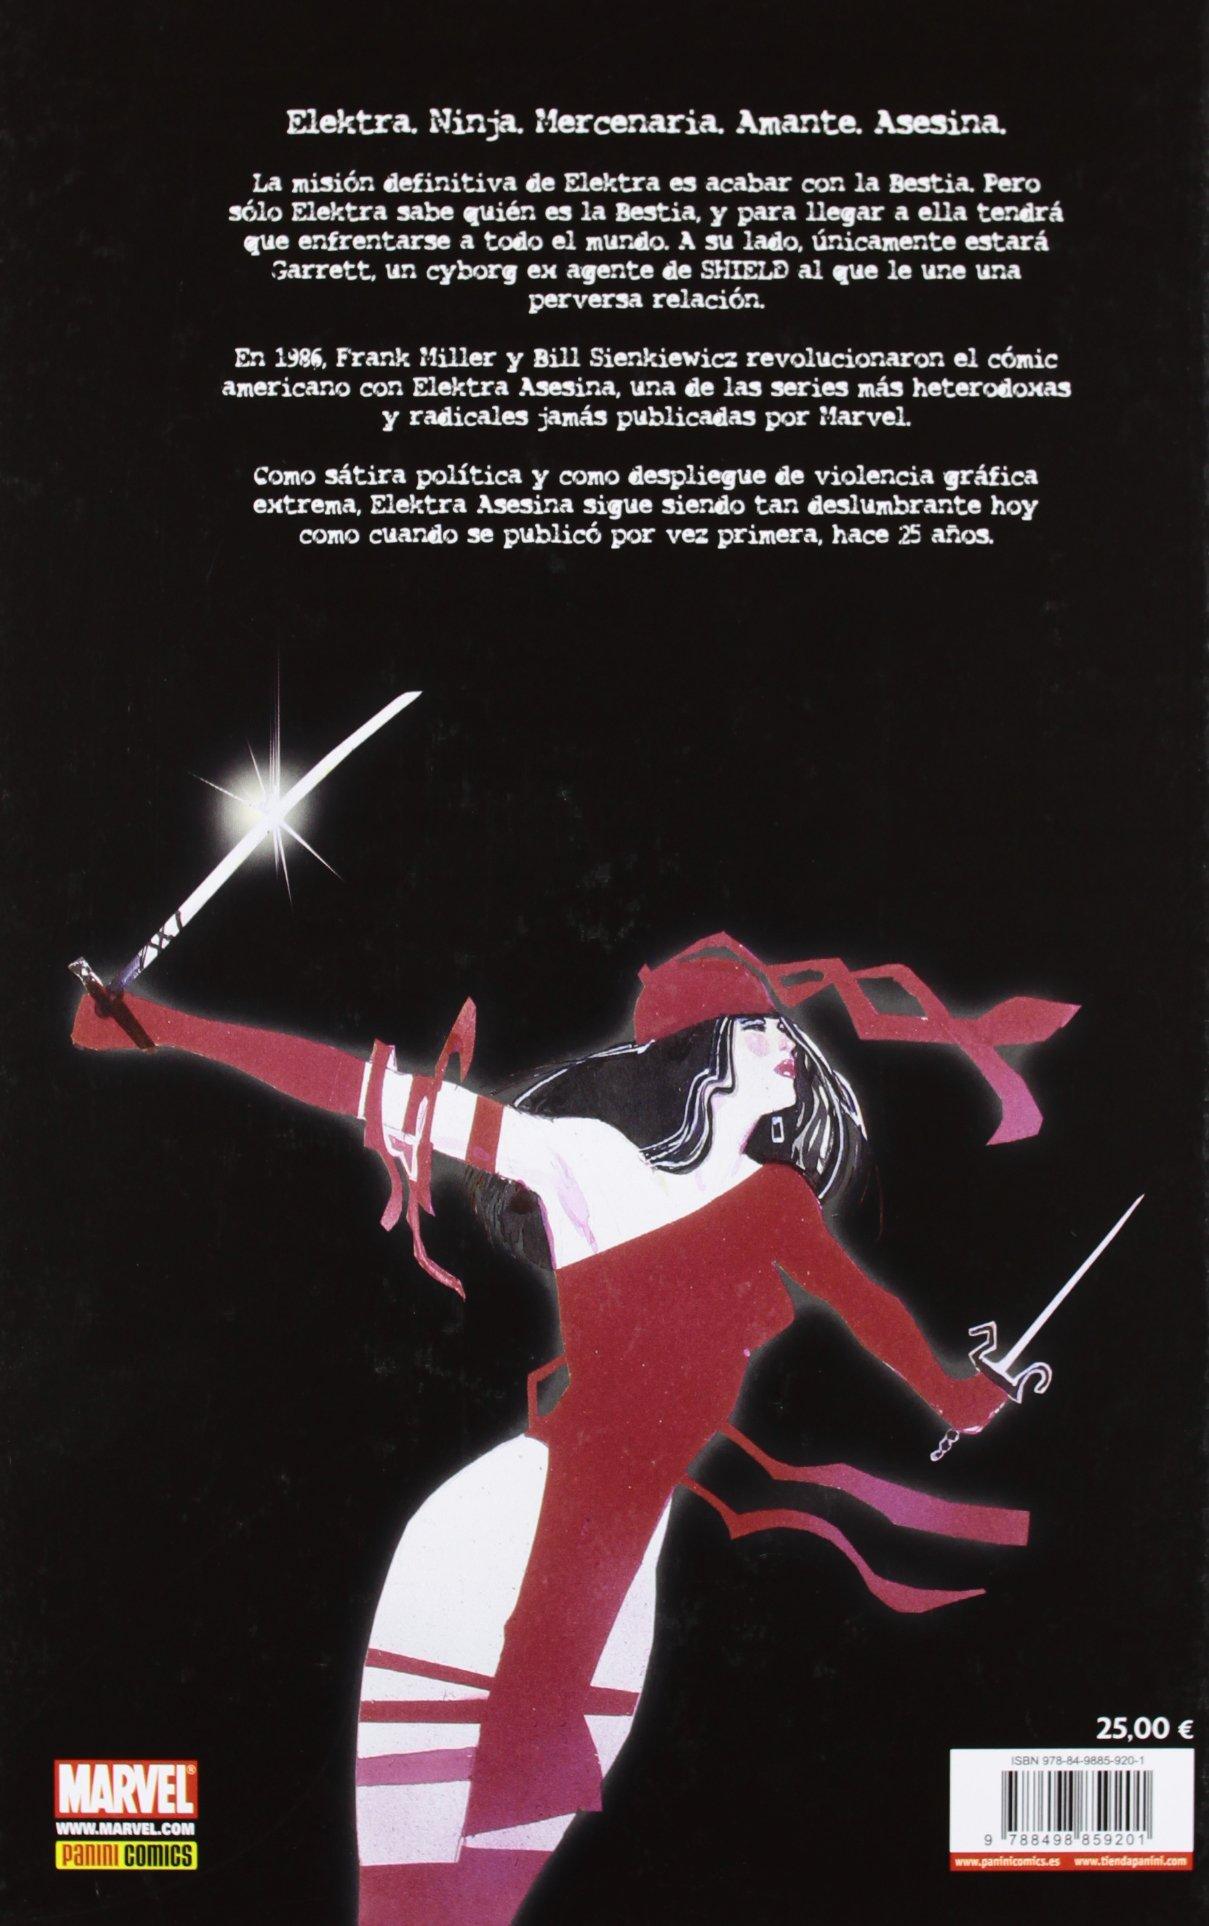 Elektra asesina: MILLER/ SIENKIEWICZ: 9788498859201: Amazon ...